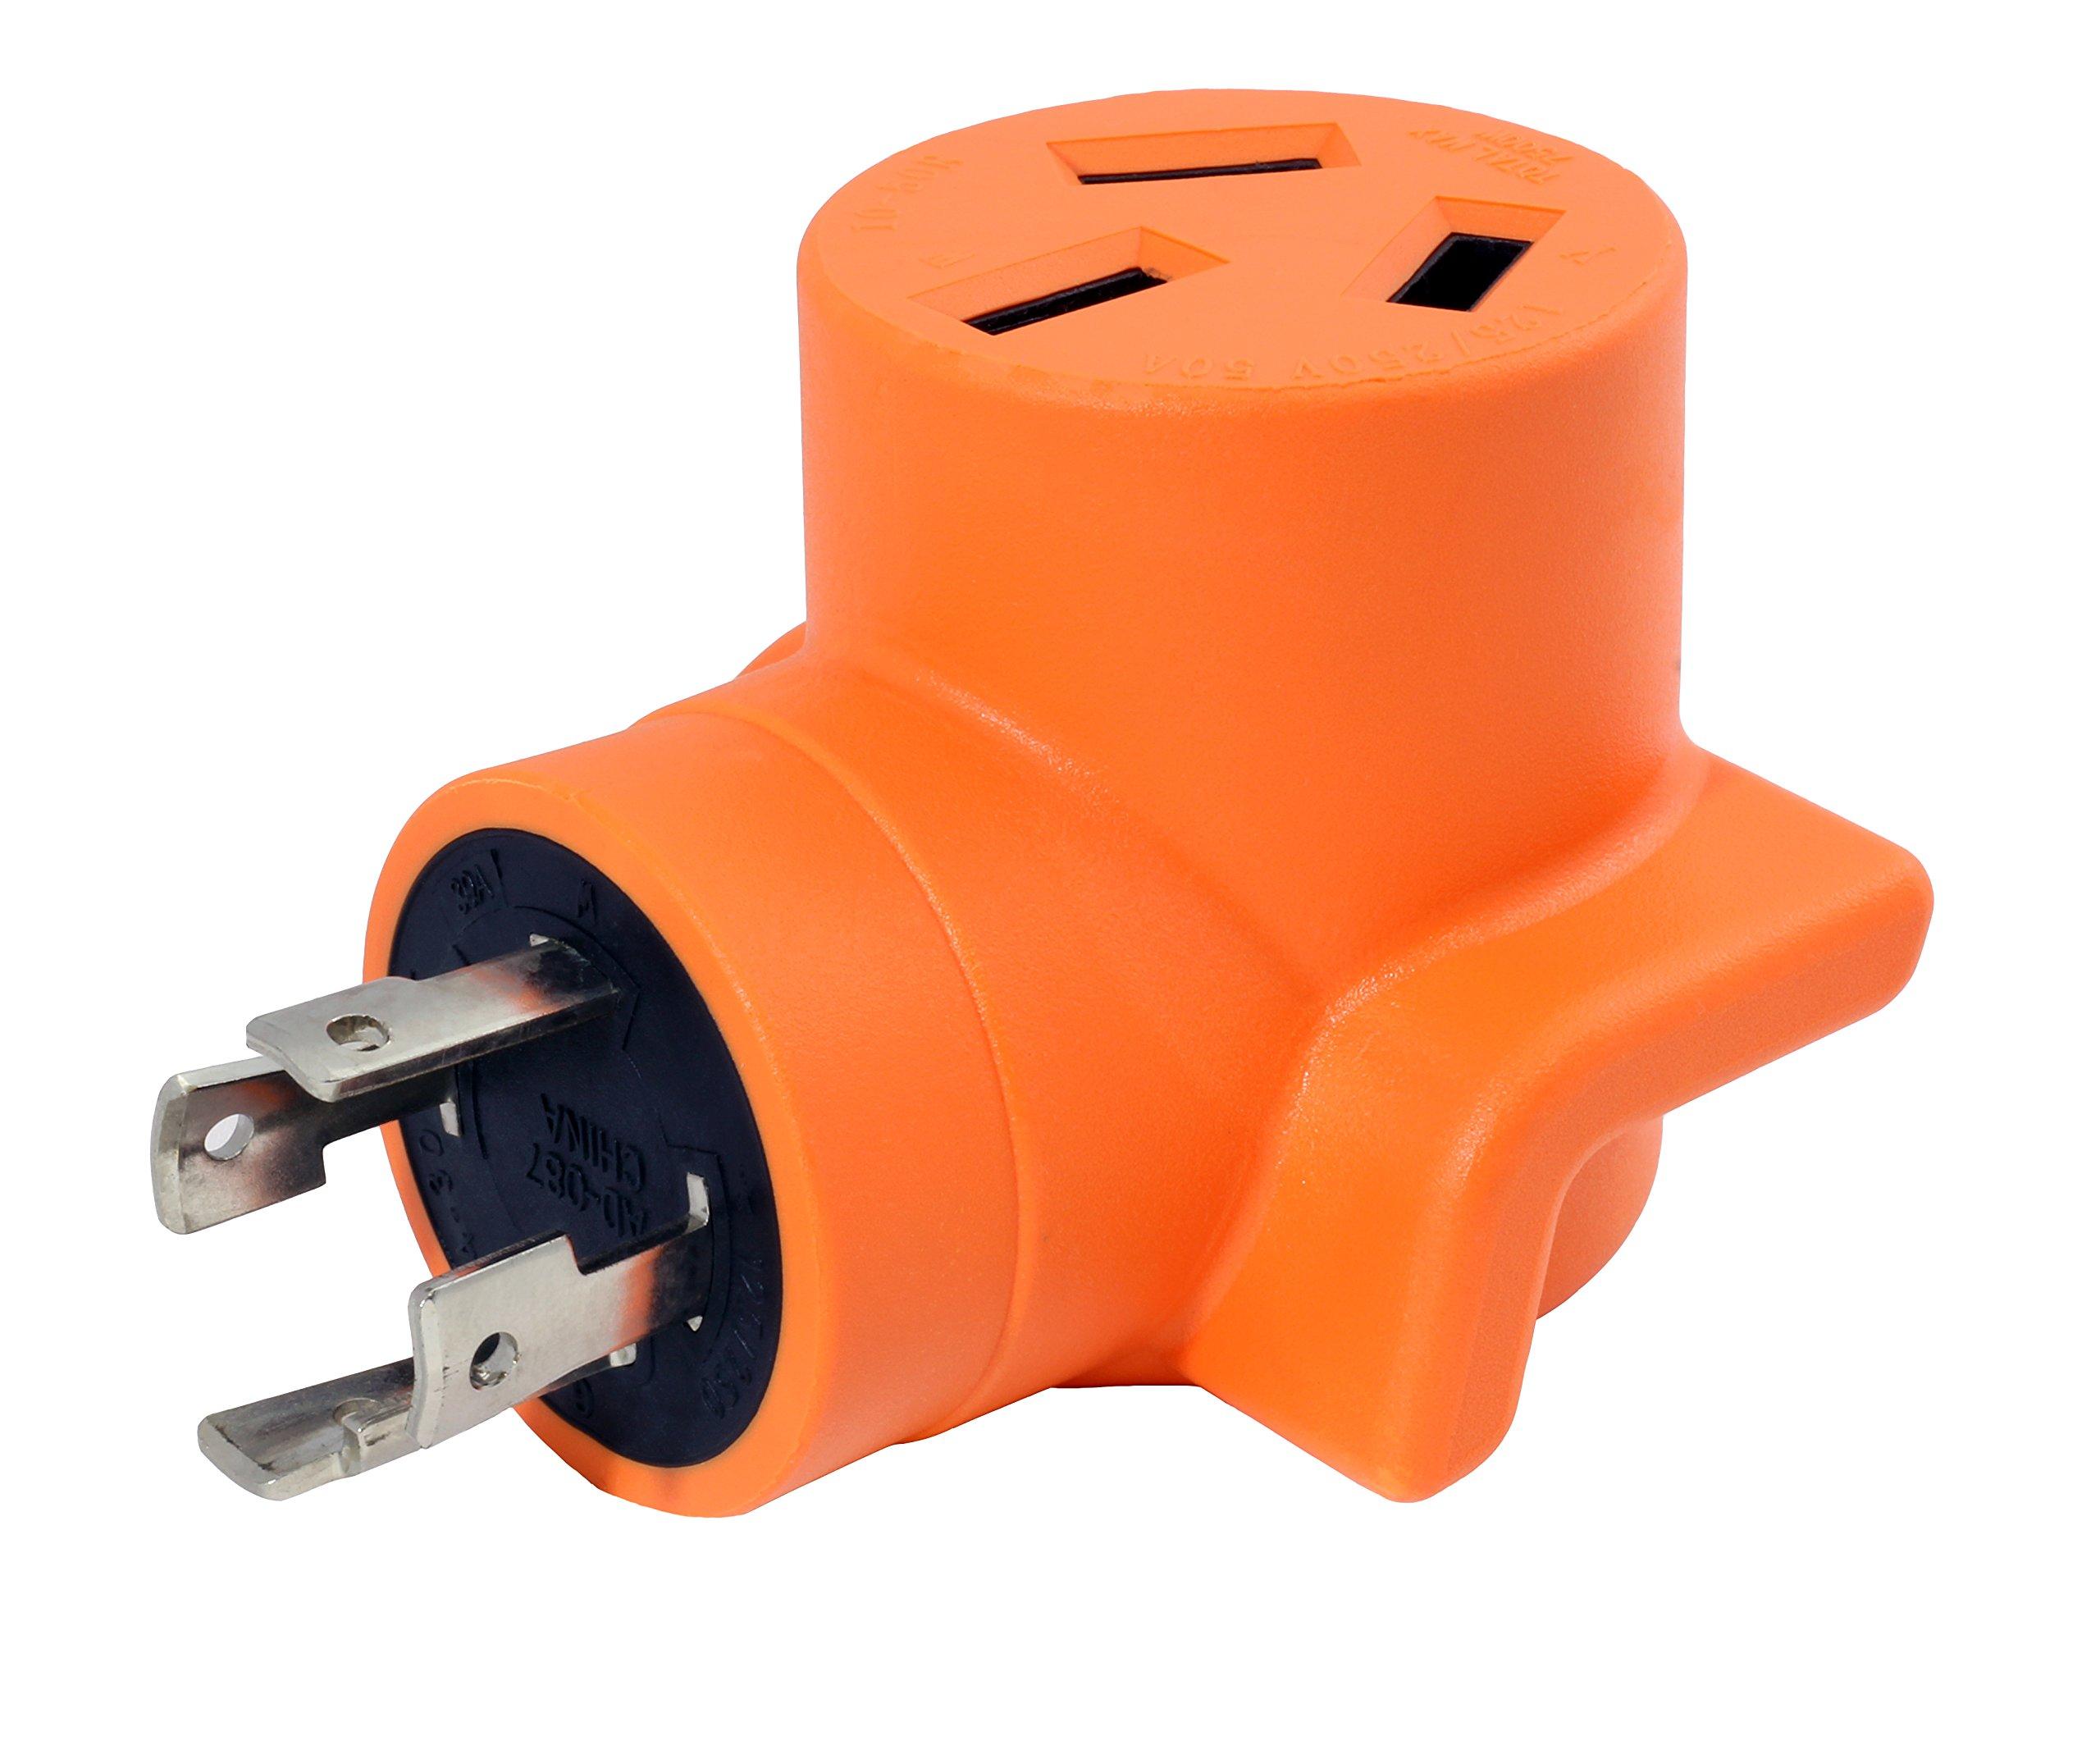 AC WORKS [WDL14301050] 30Amp 4-Prong L14-30P Generator Locking Plug to 10-50R 50Amp 125/250Volt Welder adapter